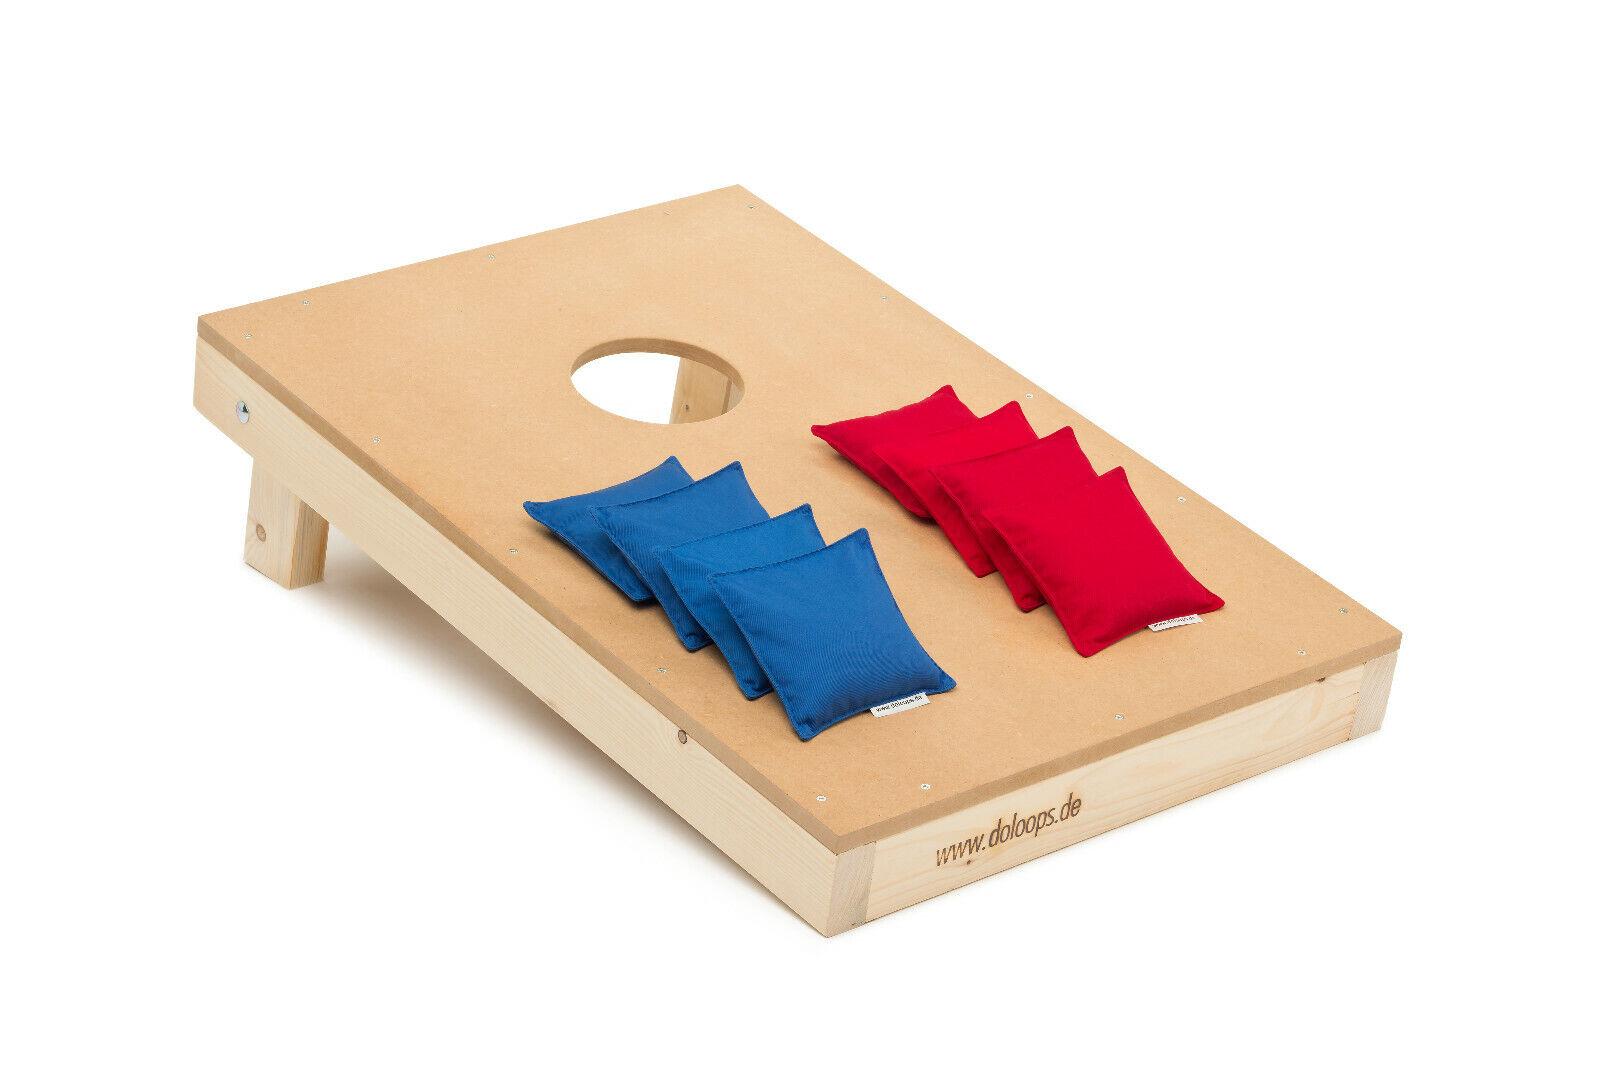 Original Original Original Cornhole Set  -  Spielset mit 1 Board + 4 rote und 4 blaue Bags 154955